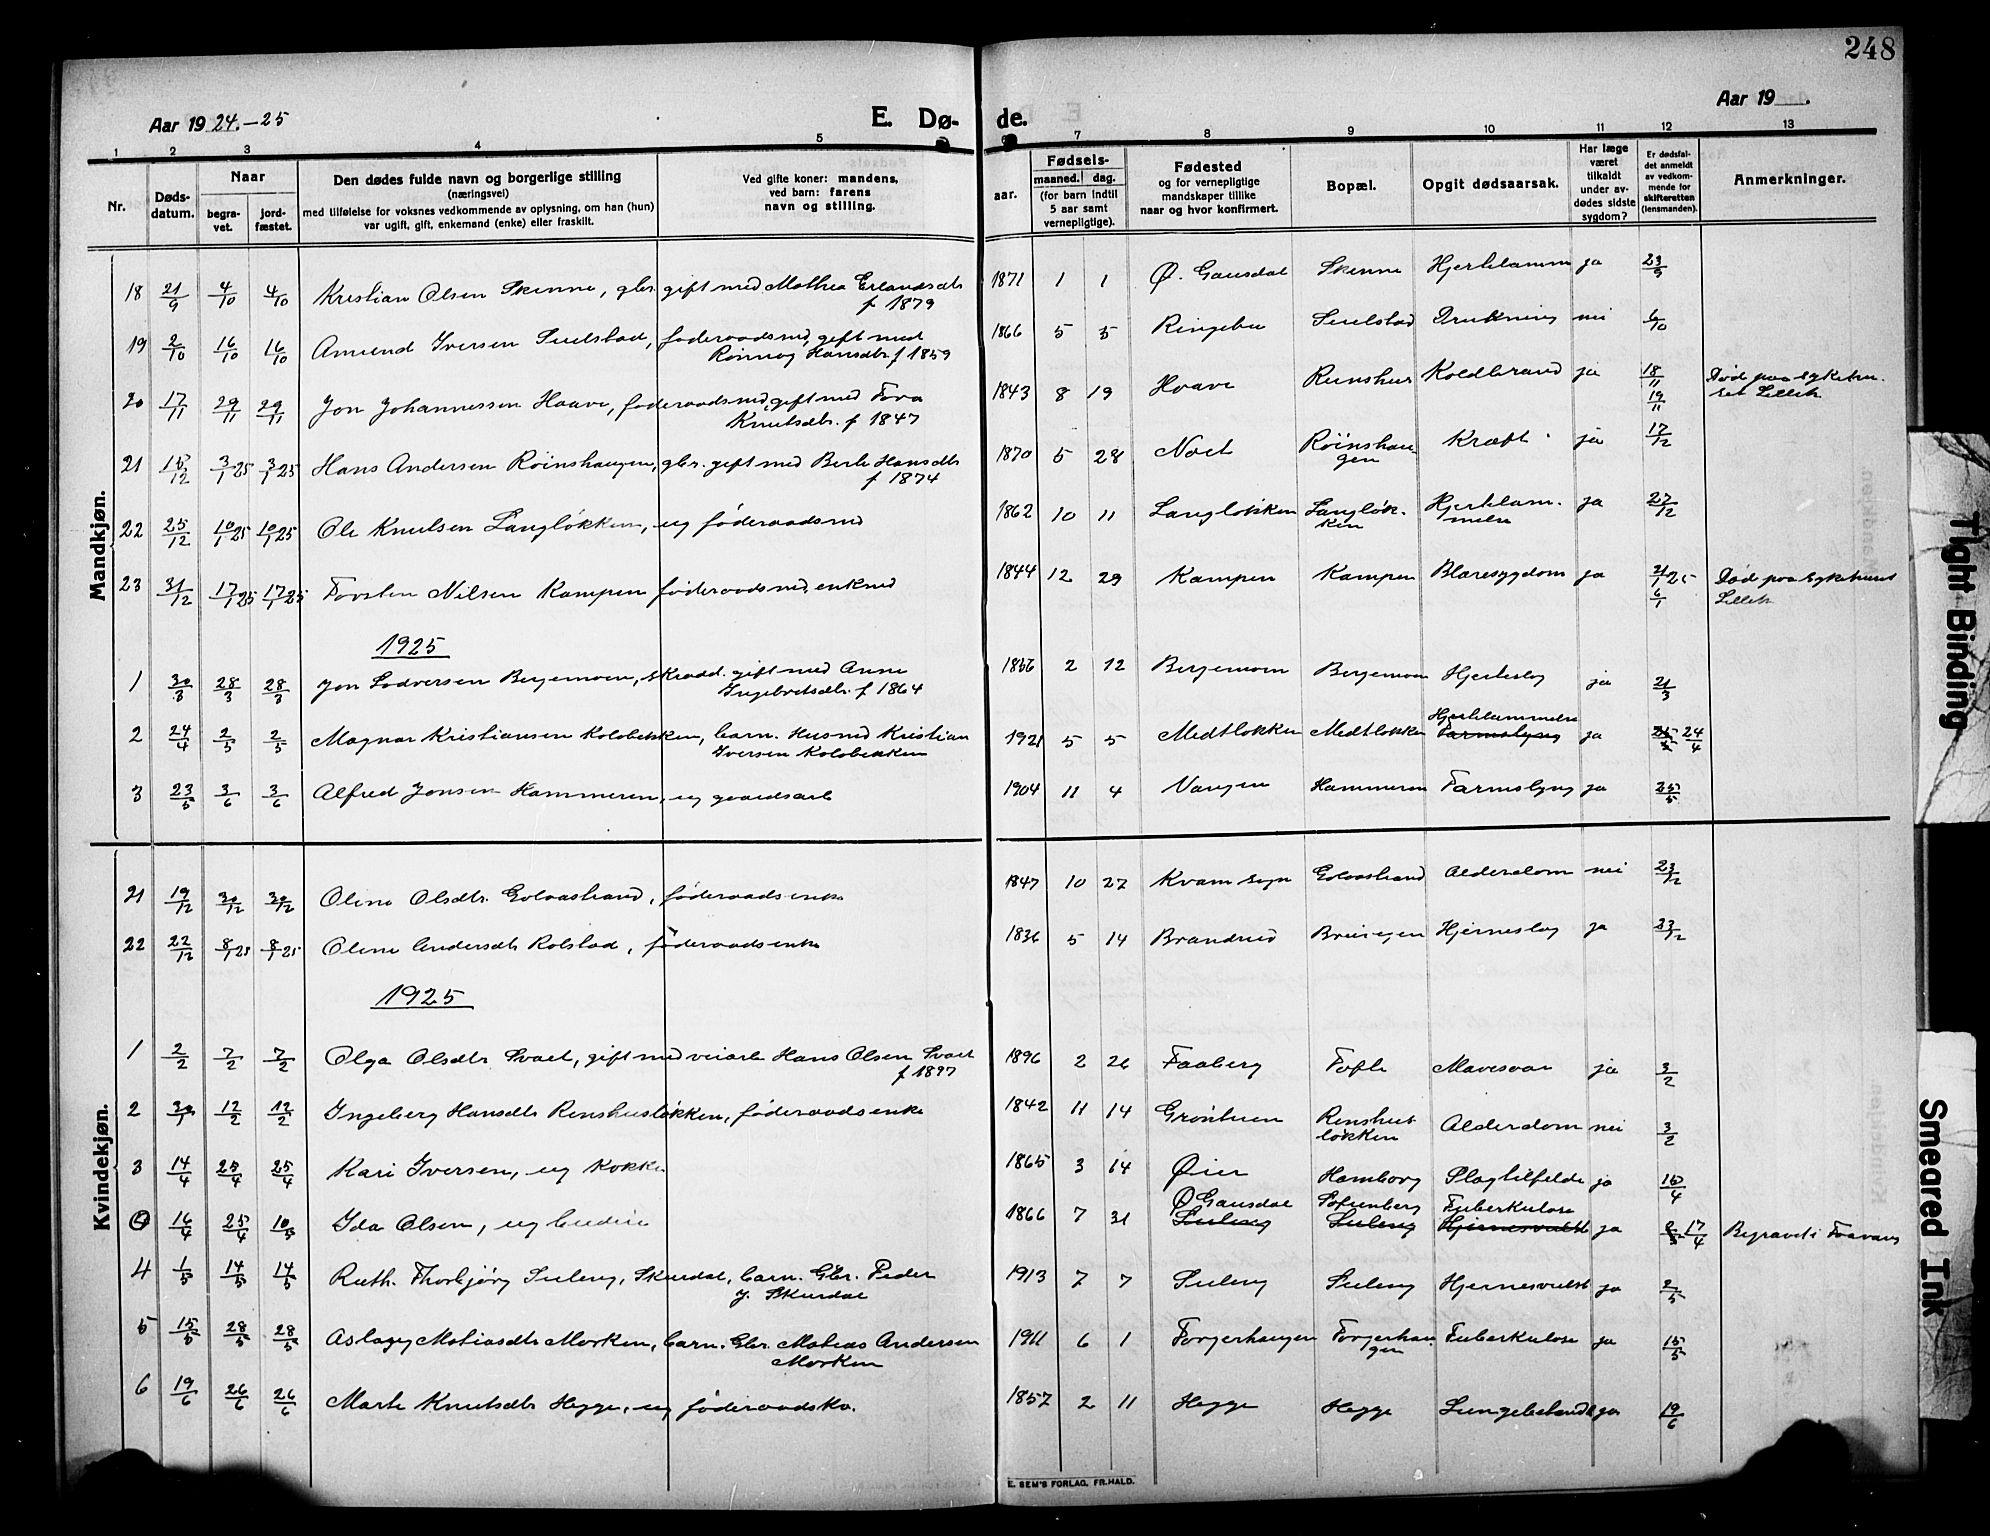 SAH, Sør-Fron prestekontor, H/Ha/Hab/L0005: Klokkerbok nr. 5, 1912-1930, s. 248